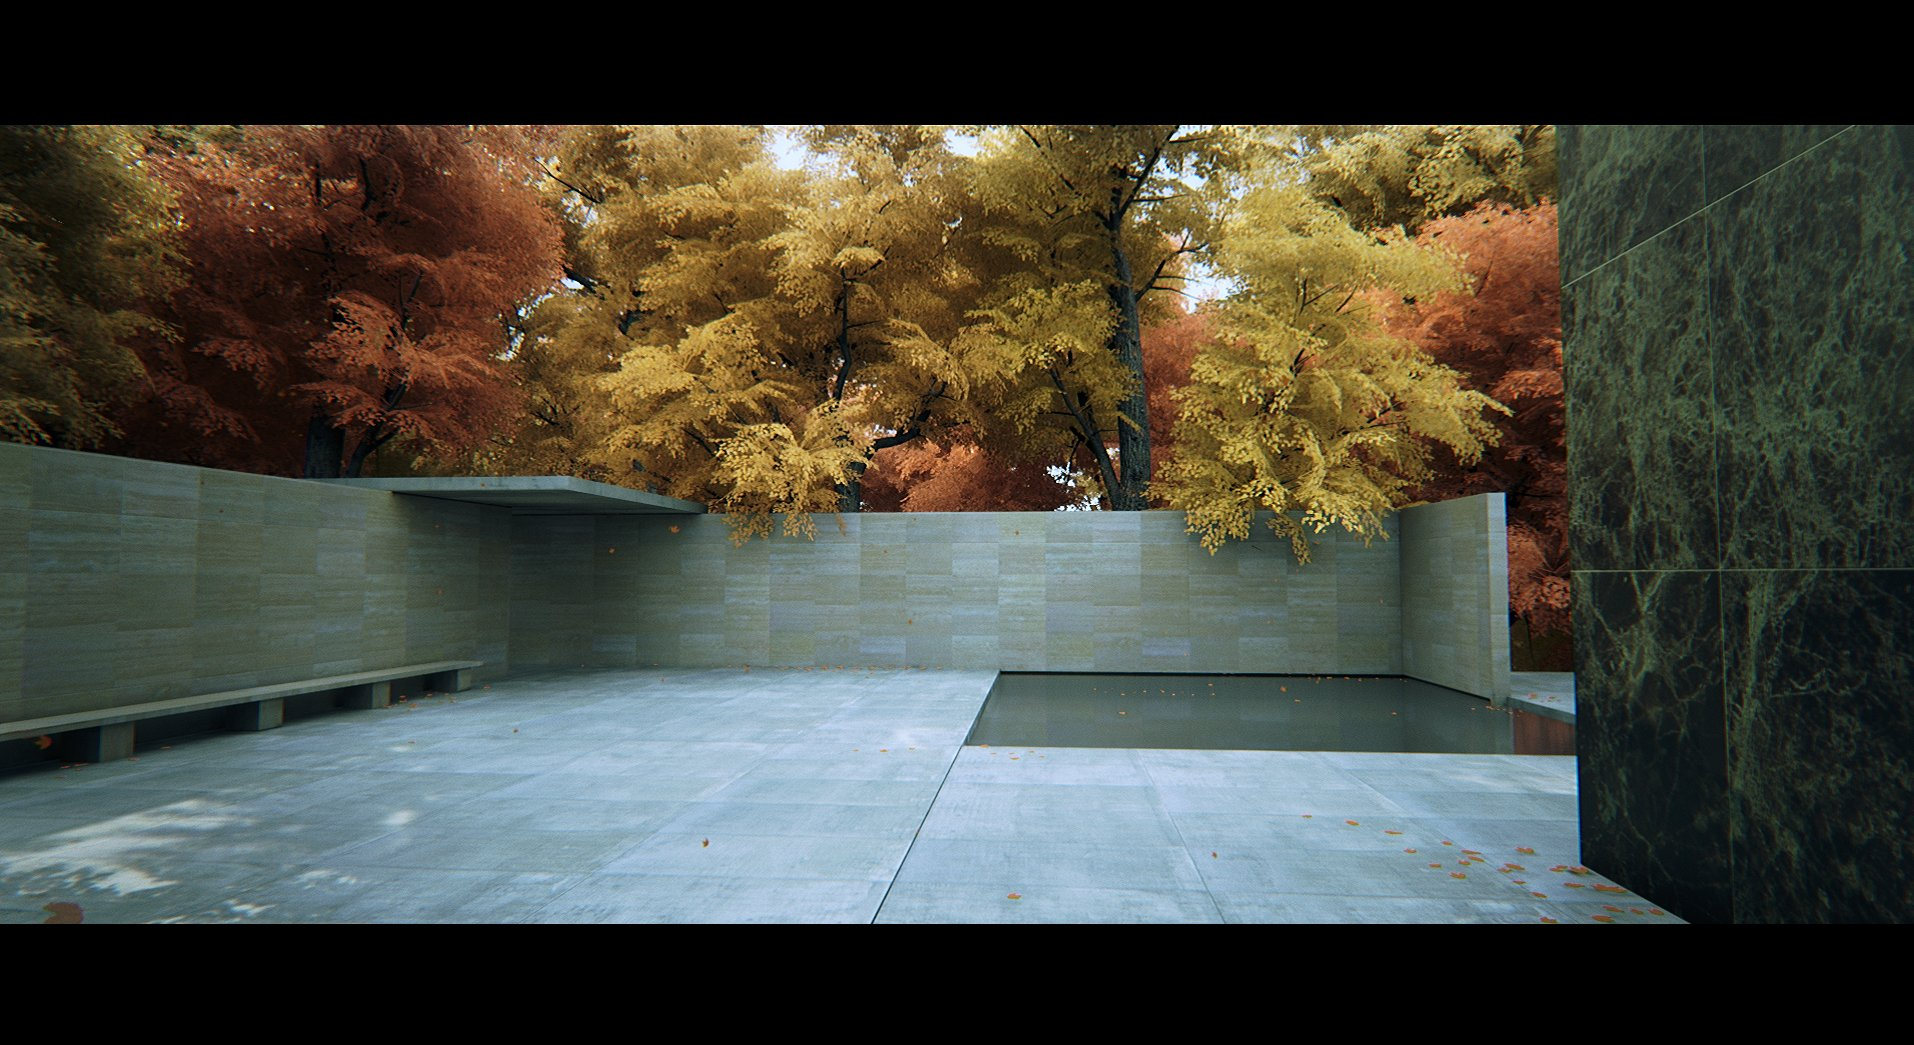 Architettura 3d in unreal 4 imaginaction for Architettura 3d